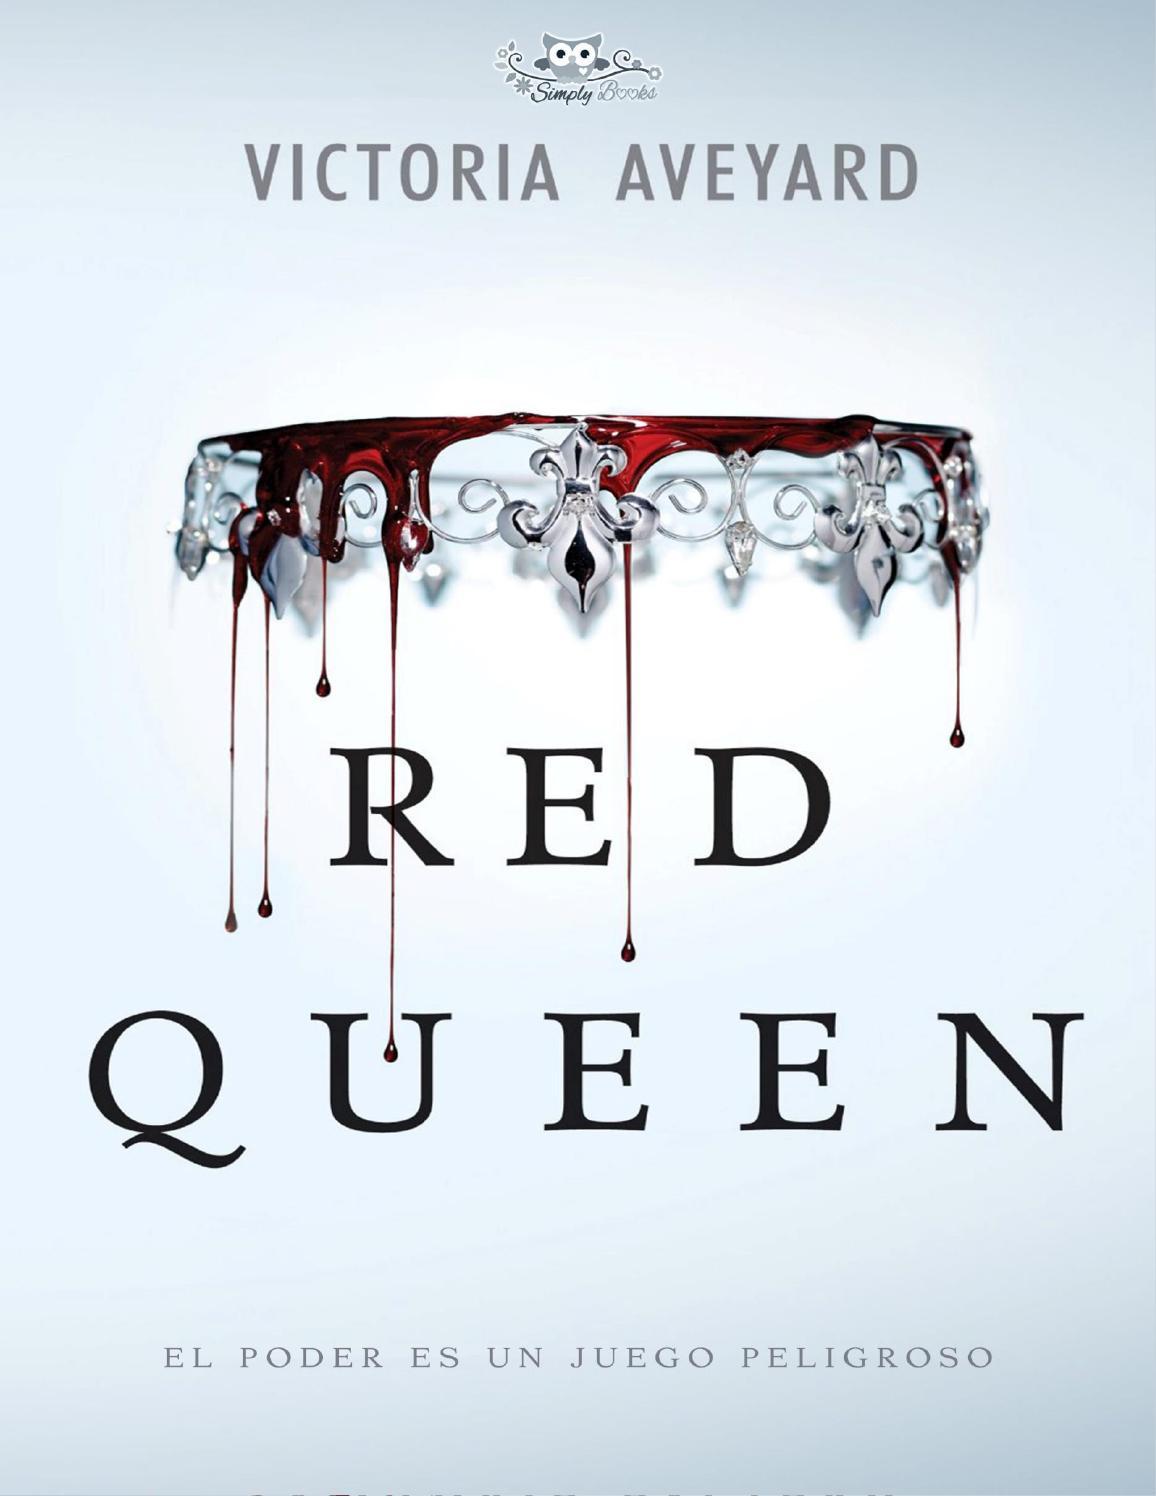 Red queen victoria aveyard (La reina roja #1) by Angel24 - issuu